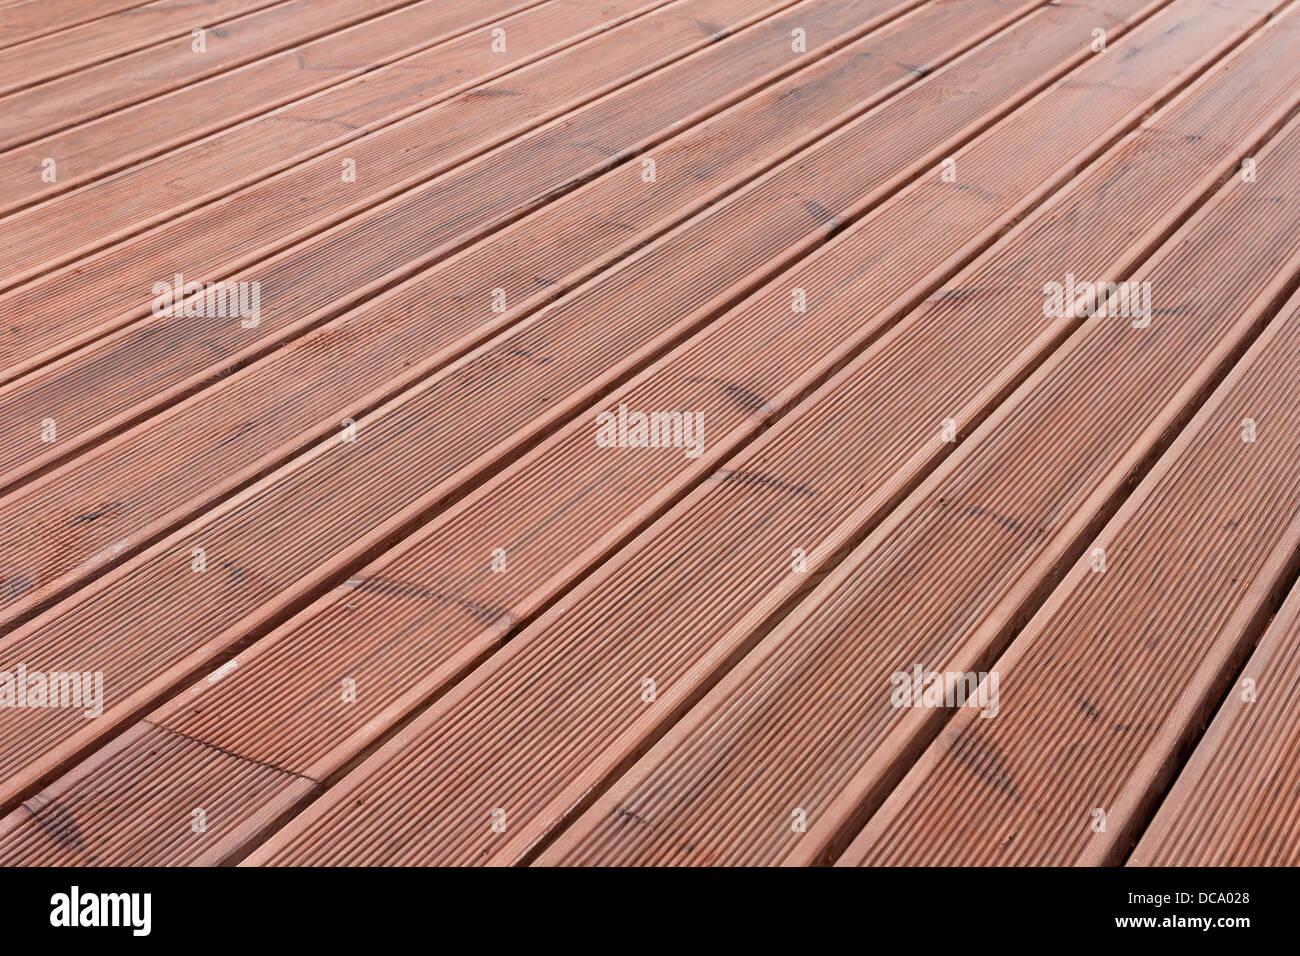 Nasses Holz Terrasse Boden Hintergrundtextur Stockfoto Bild